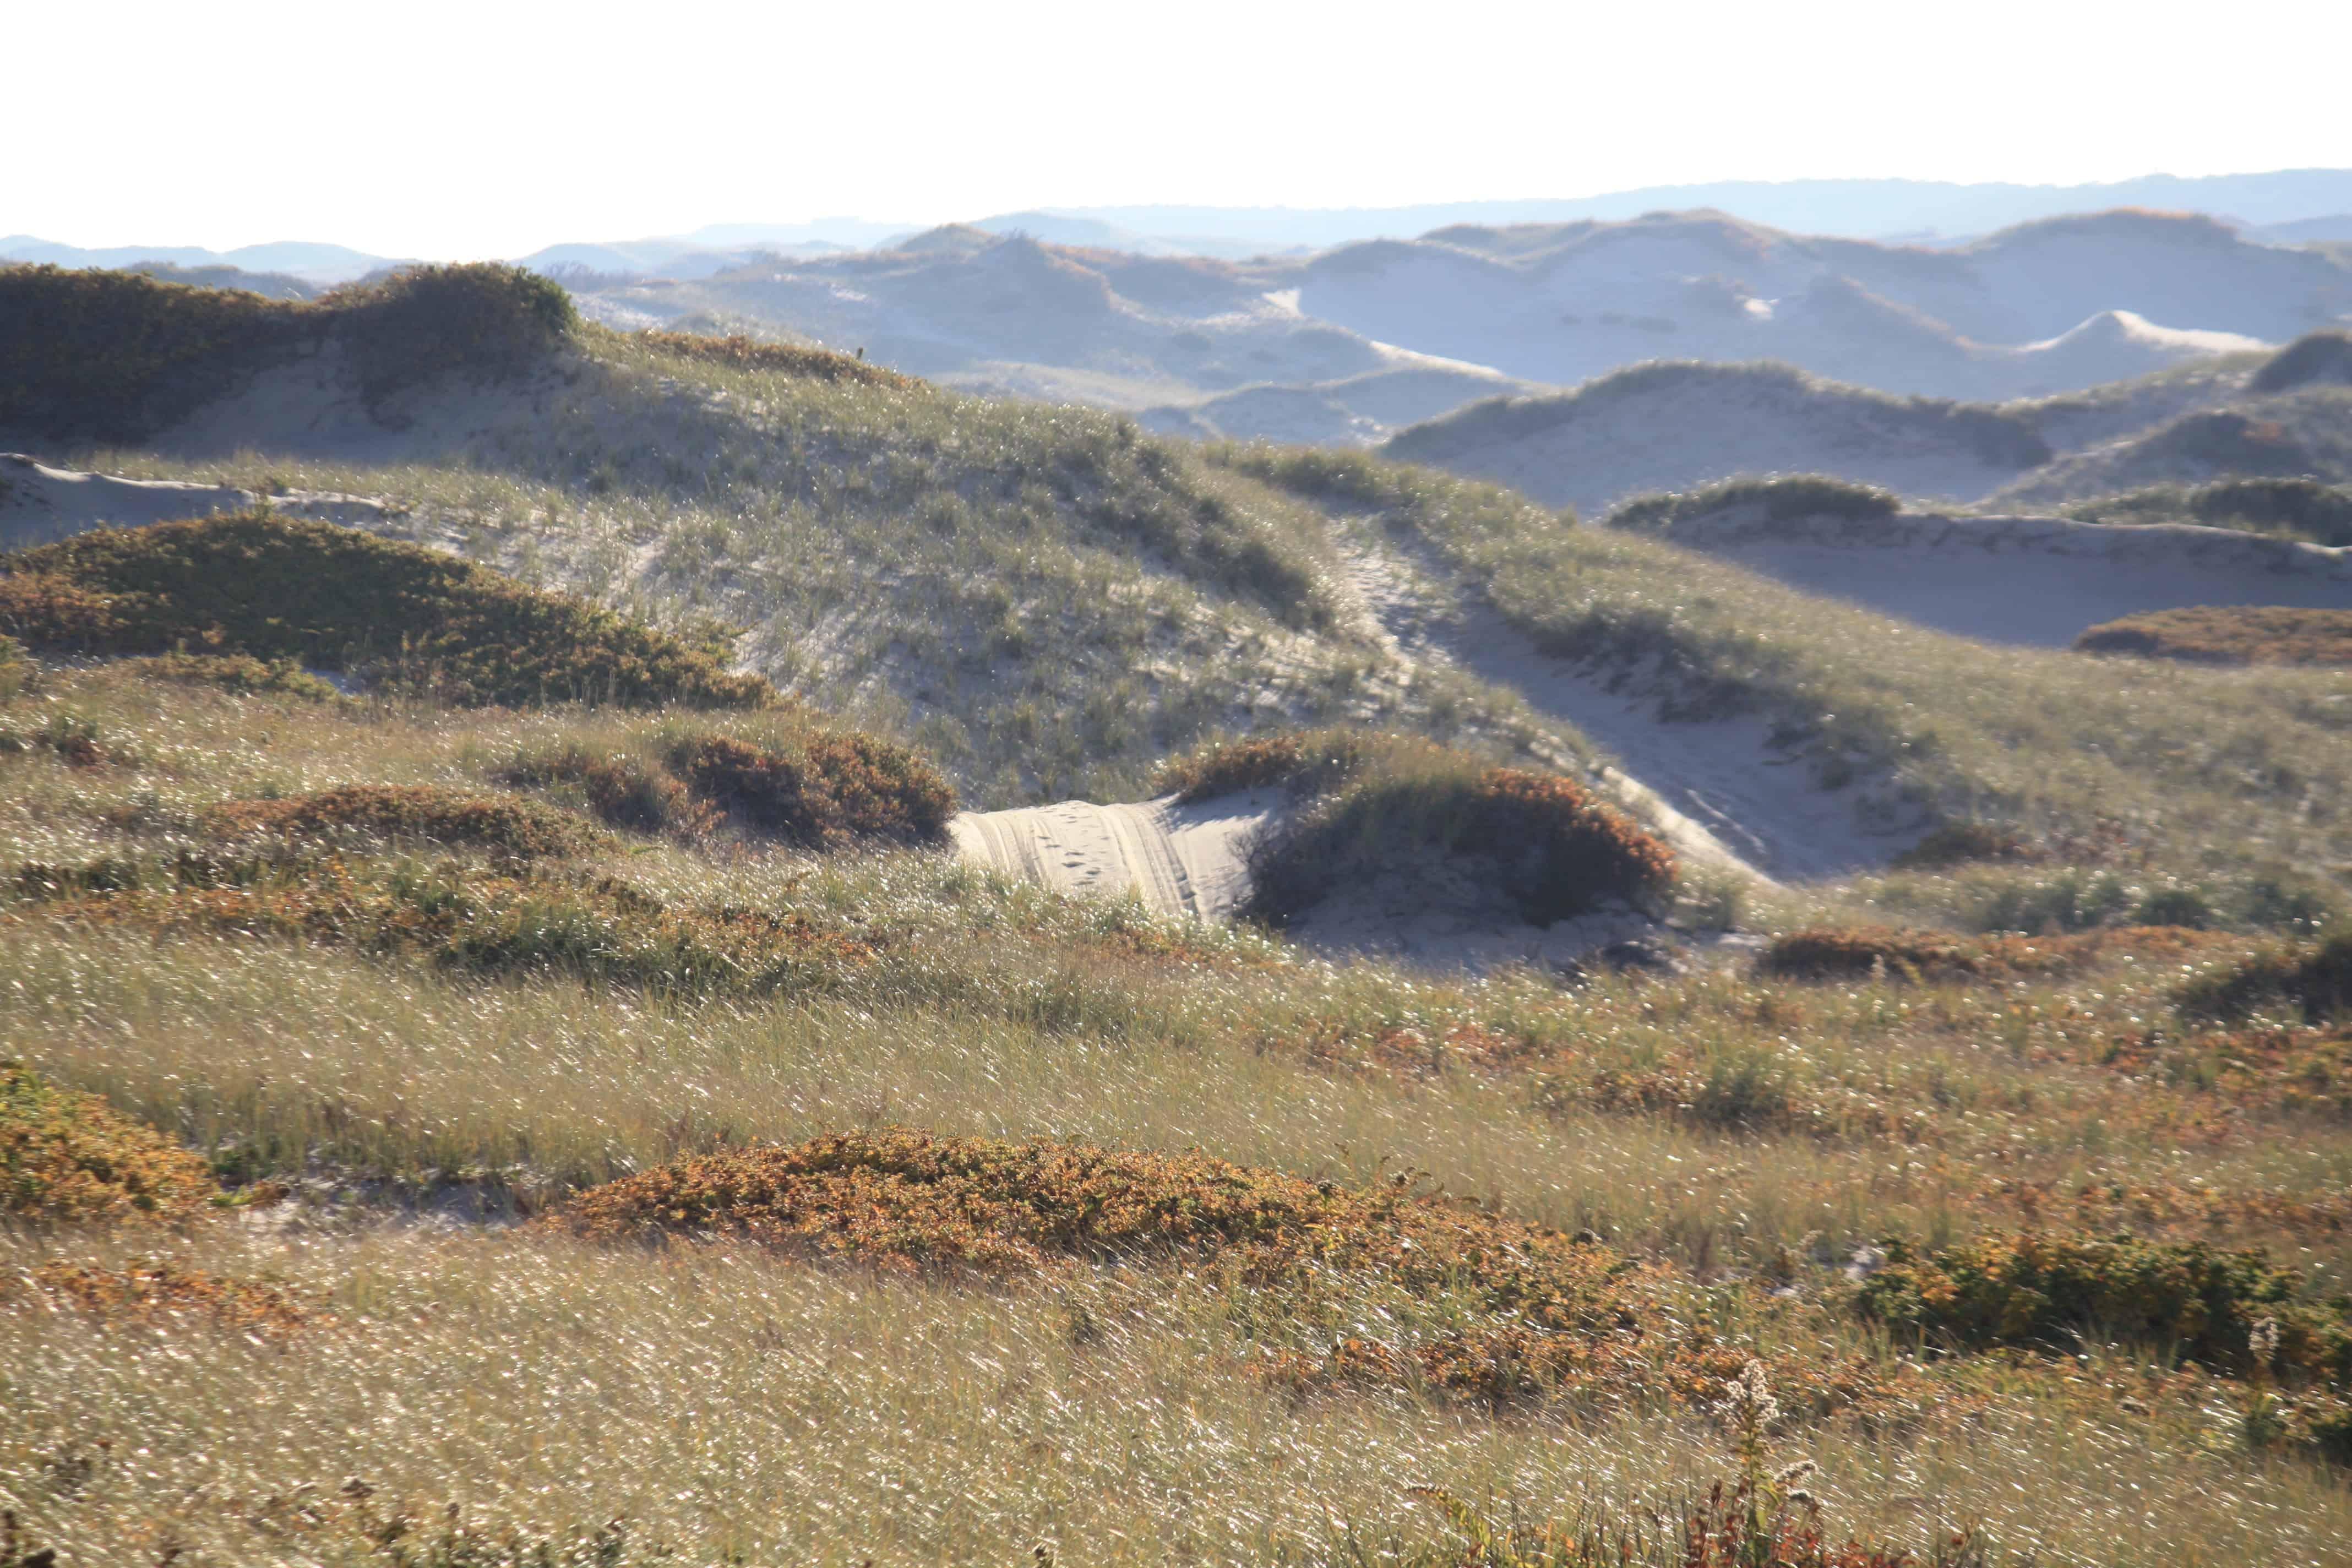 Dune Shacks Cape Cod Part - 20: Dune Shacks